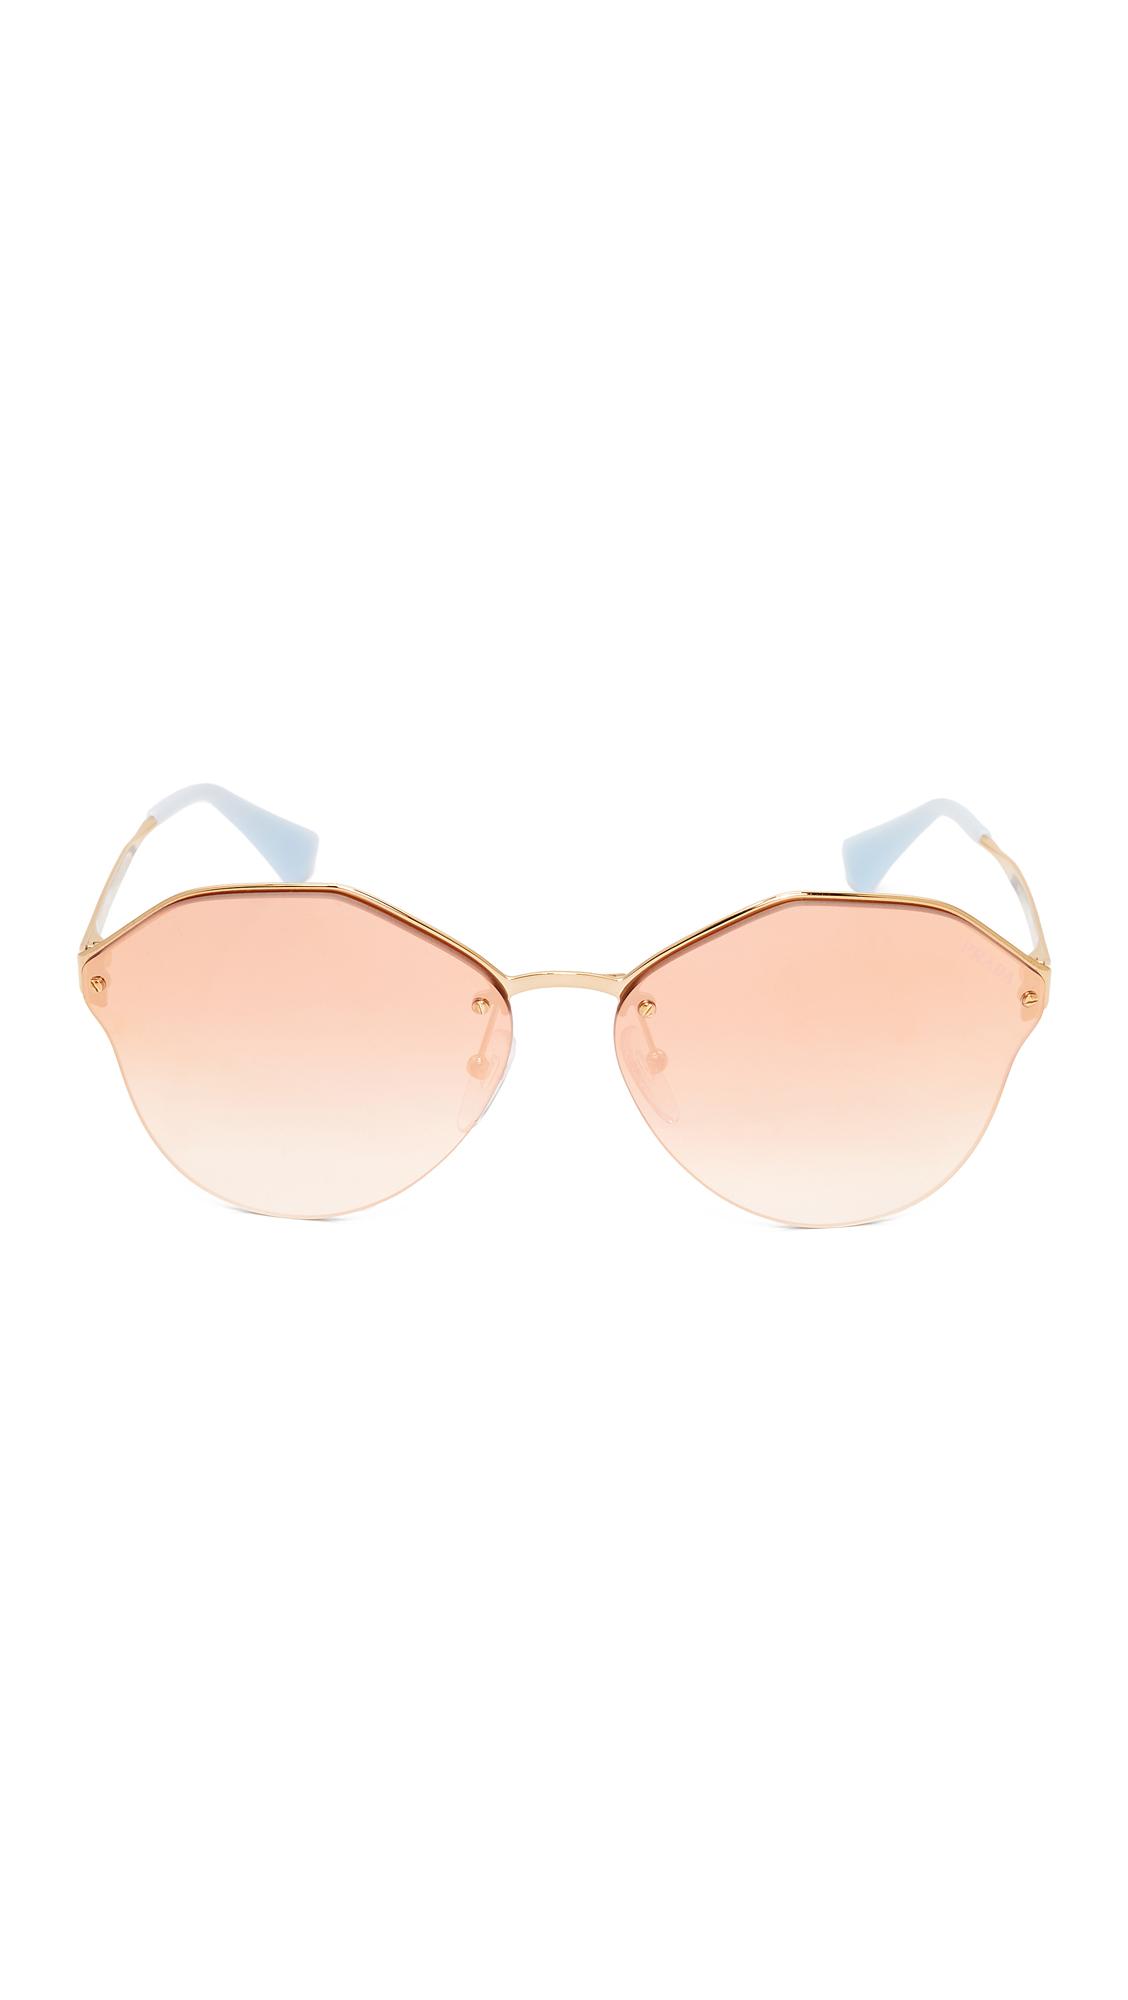 09bc32e33ee5 Prada Cinema Oval Sunglasses   SHOPBOP